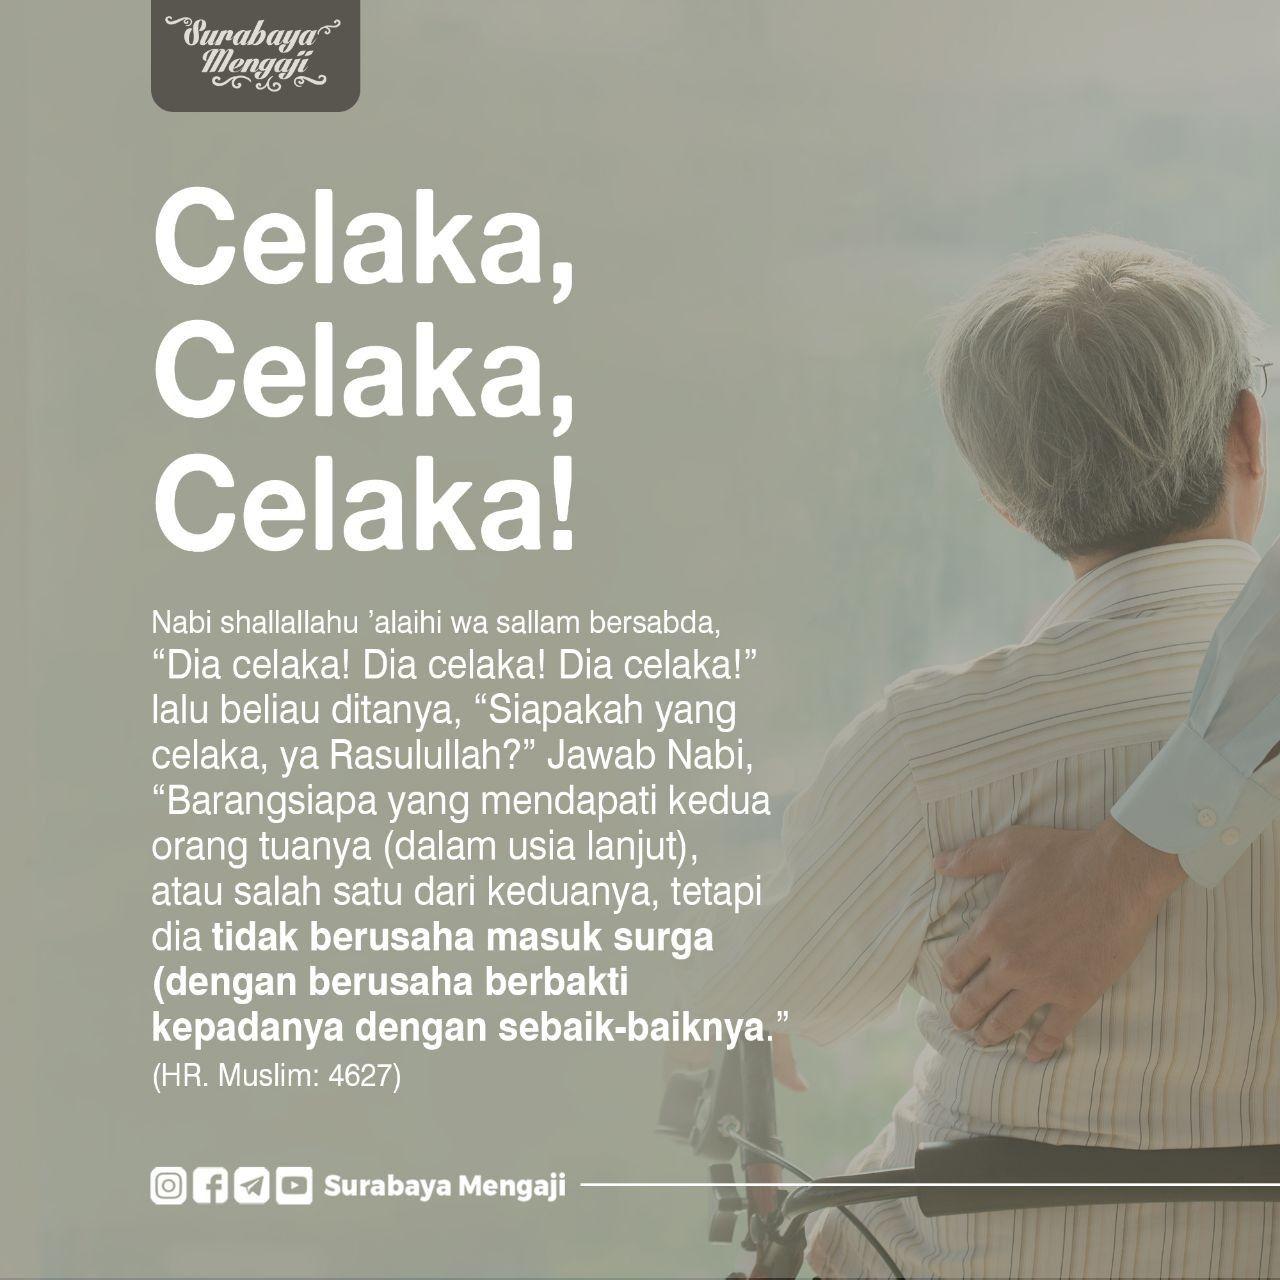 Pin Oleh Z Indahnya Sunnah Di Da Wah Posters Kata Kata Indah Kutipan Pelajaran Hidup Kata Kata